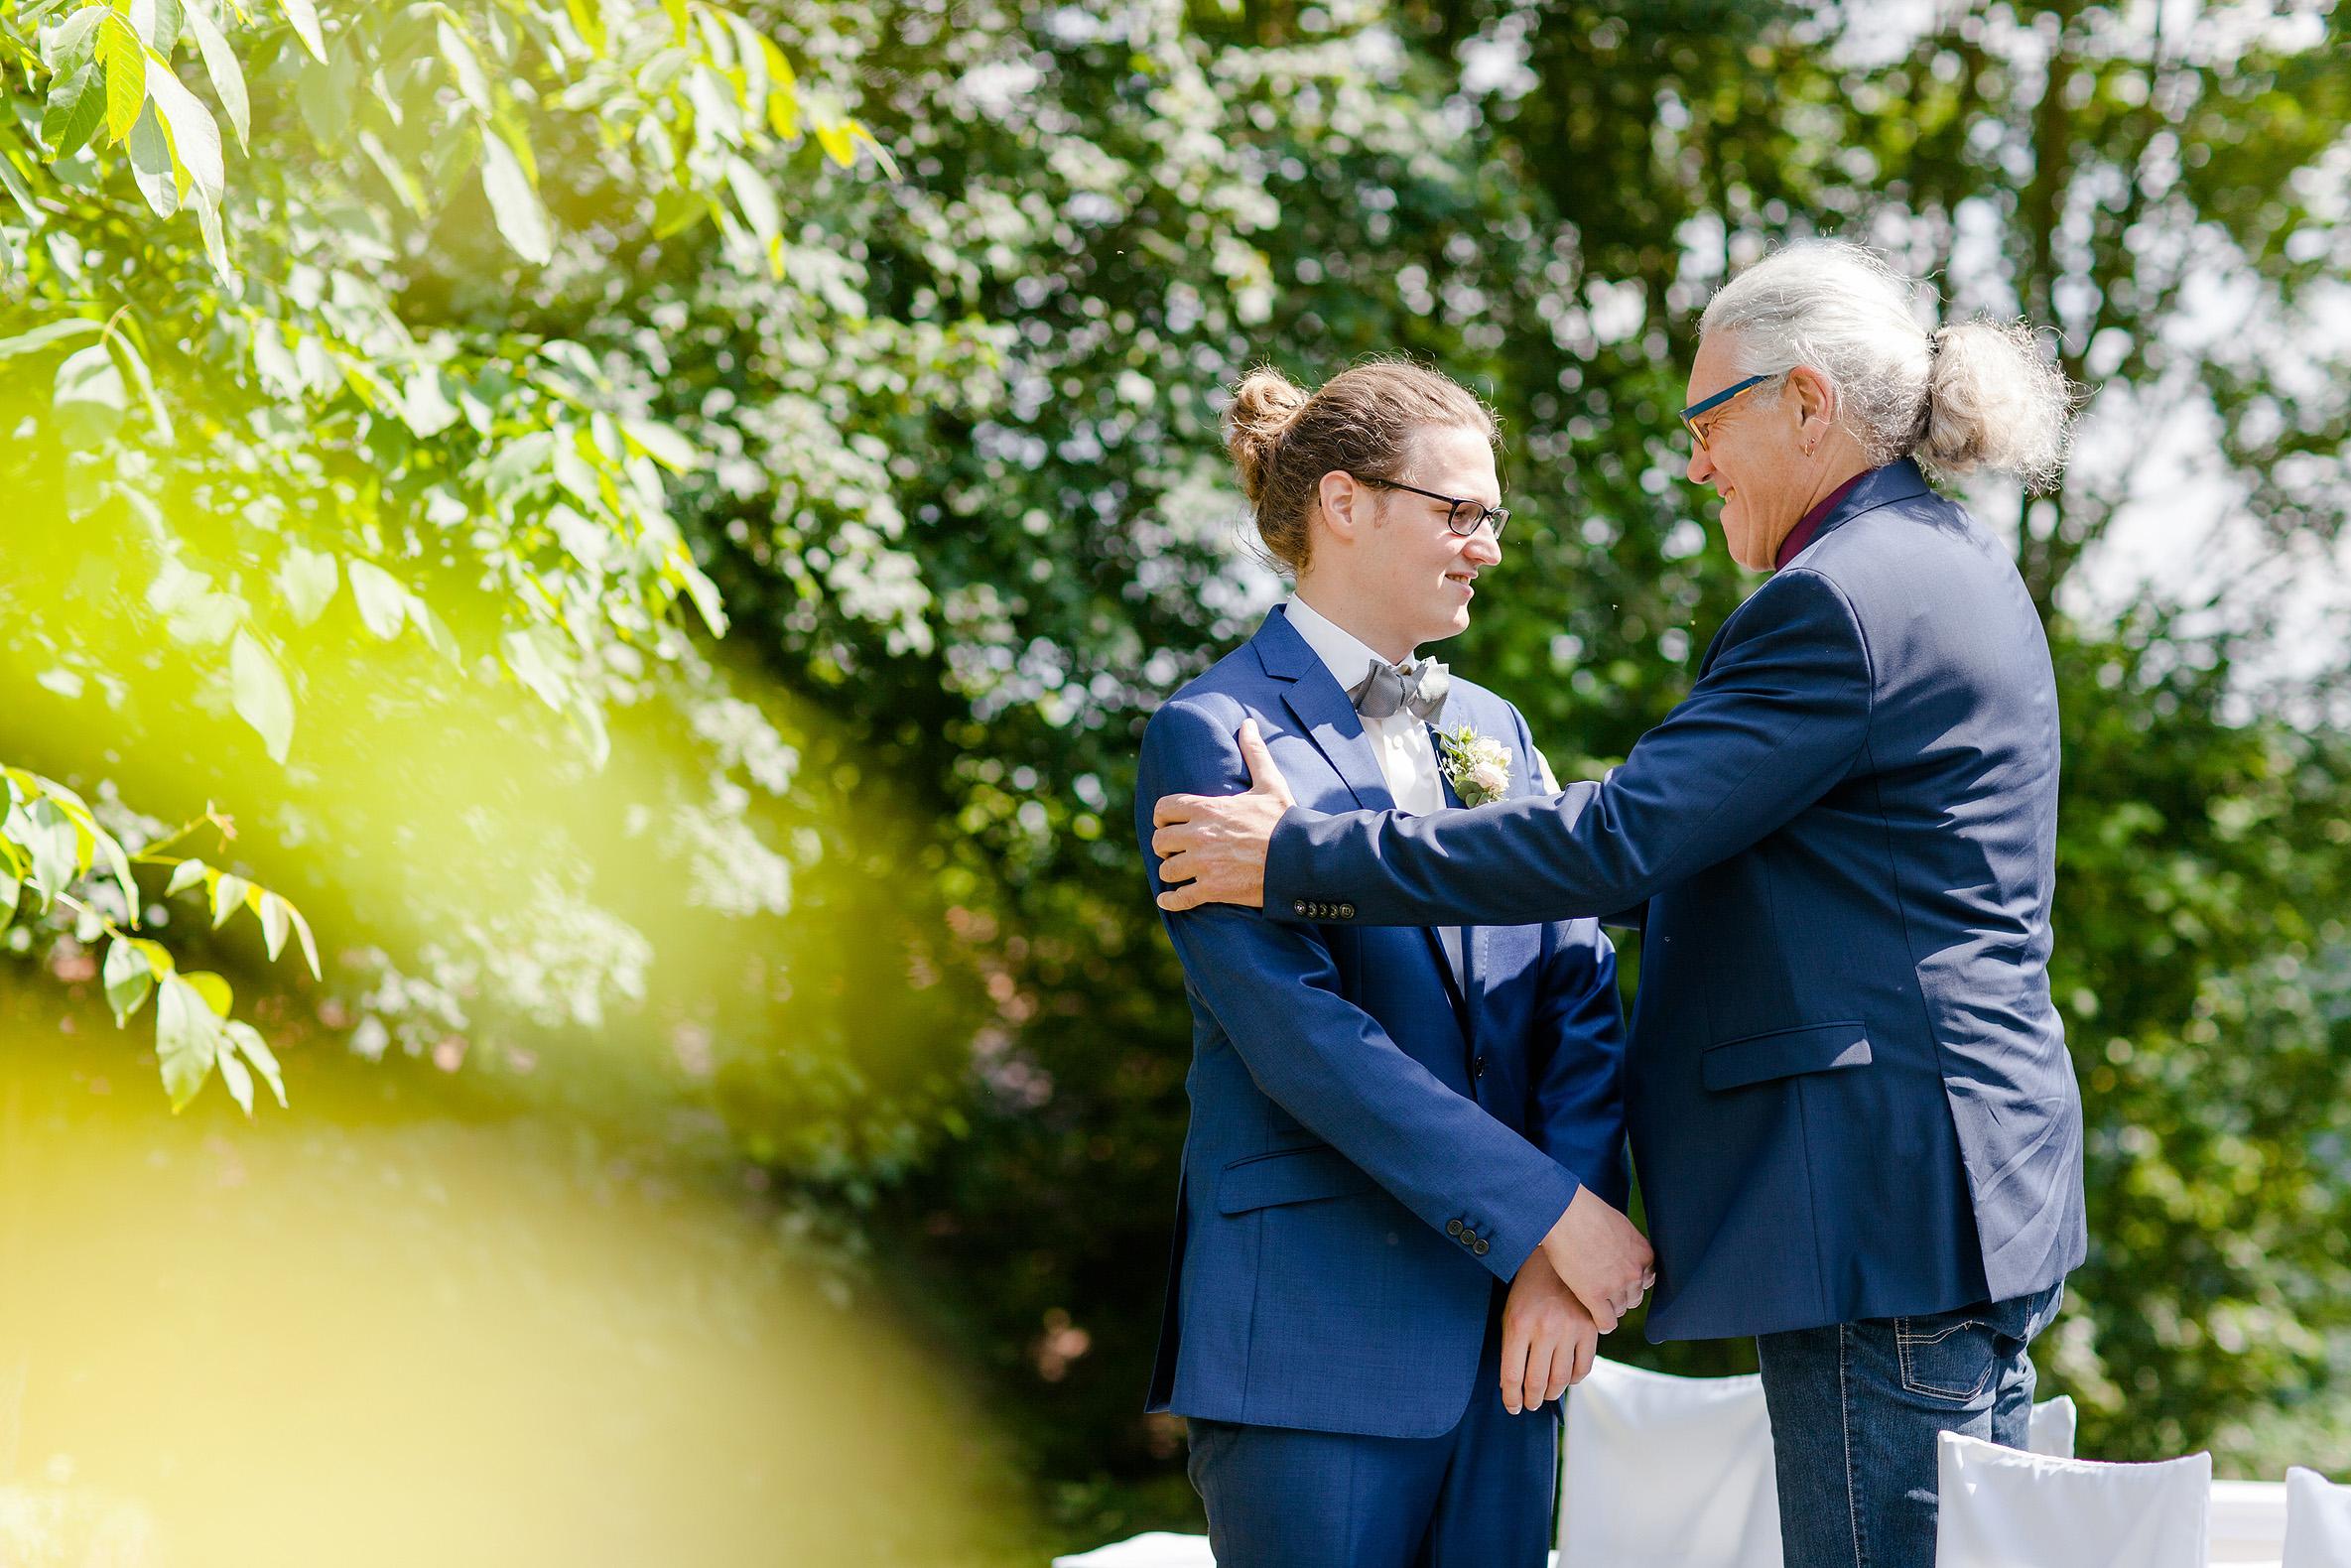 Hochzeitsfotograf Würzburg, Daria Gleich